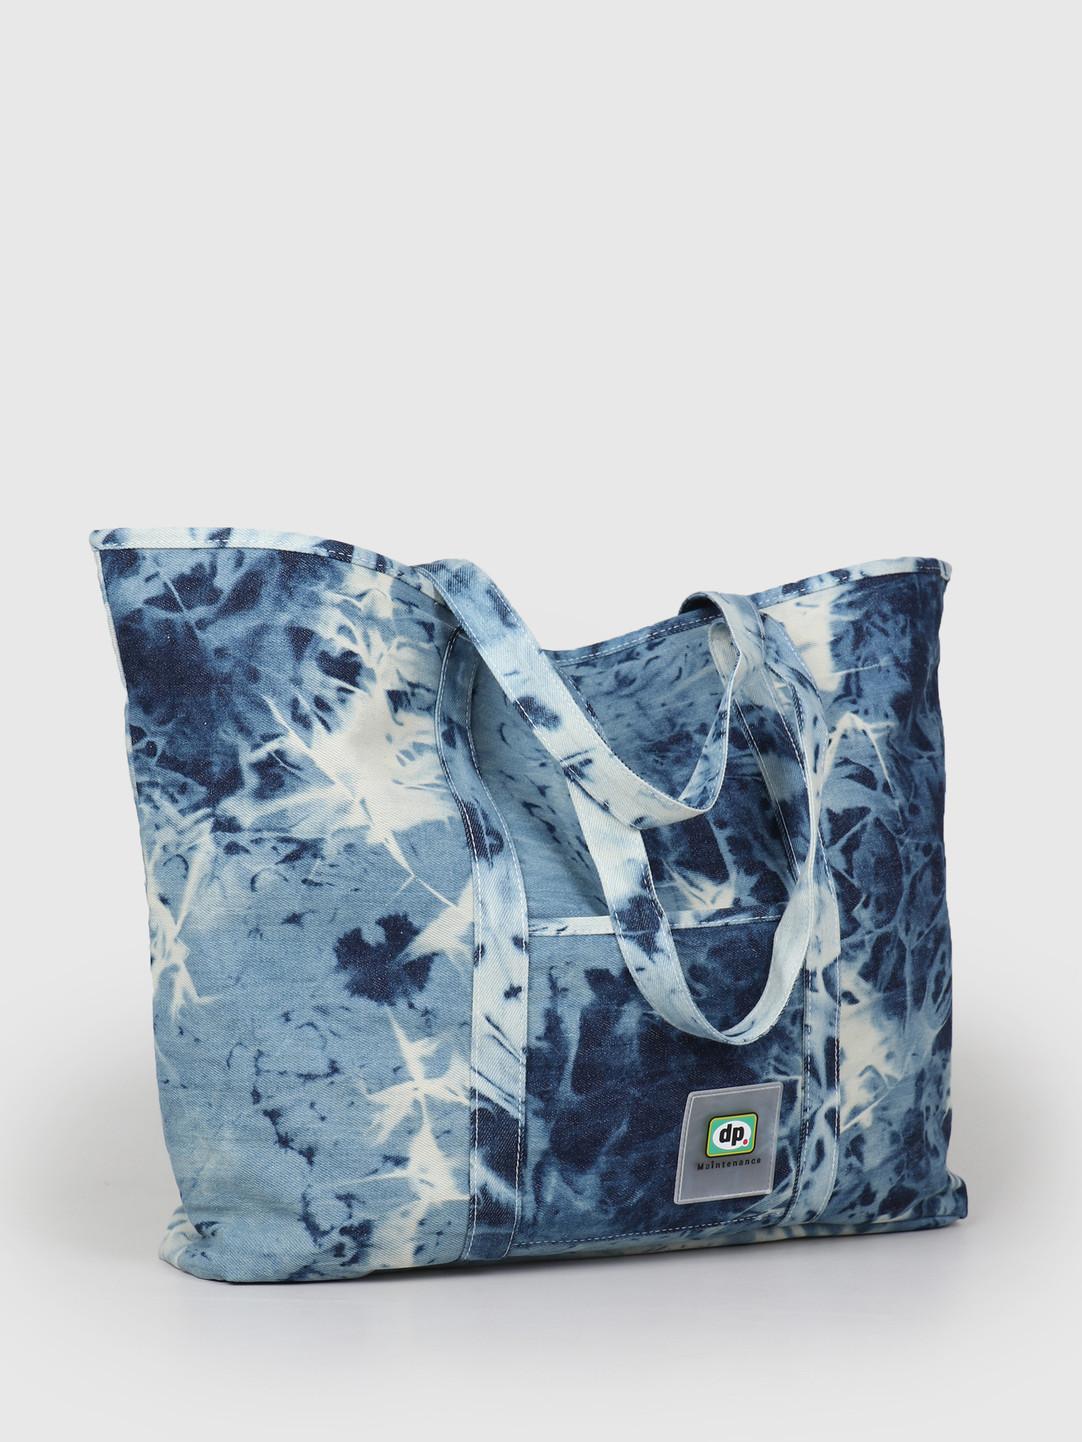 Daily Paper Daily Paper Feach Bag Denim Blue 19S1AC24-01